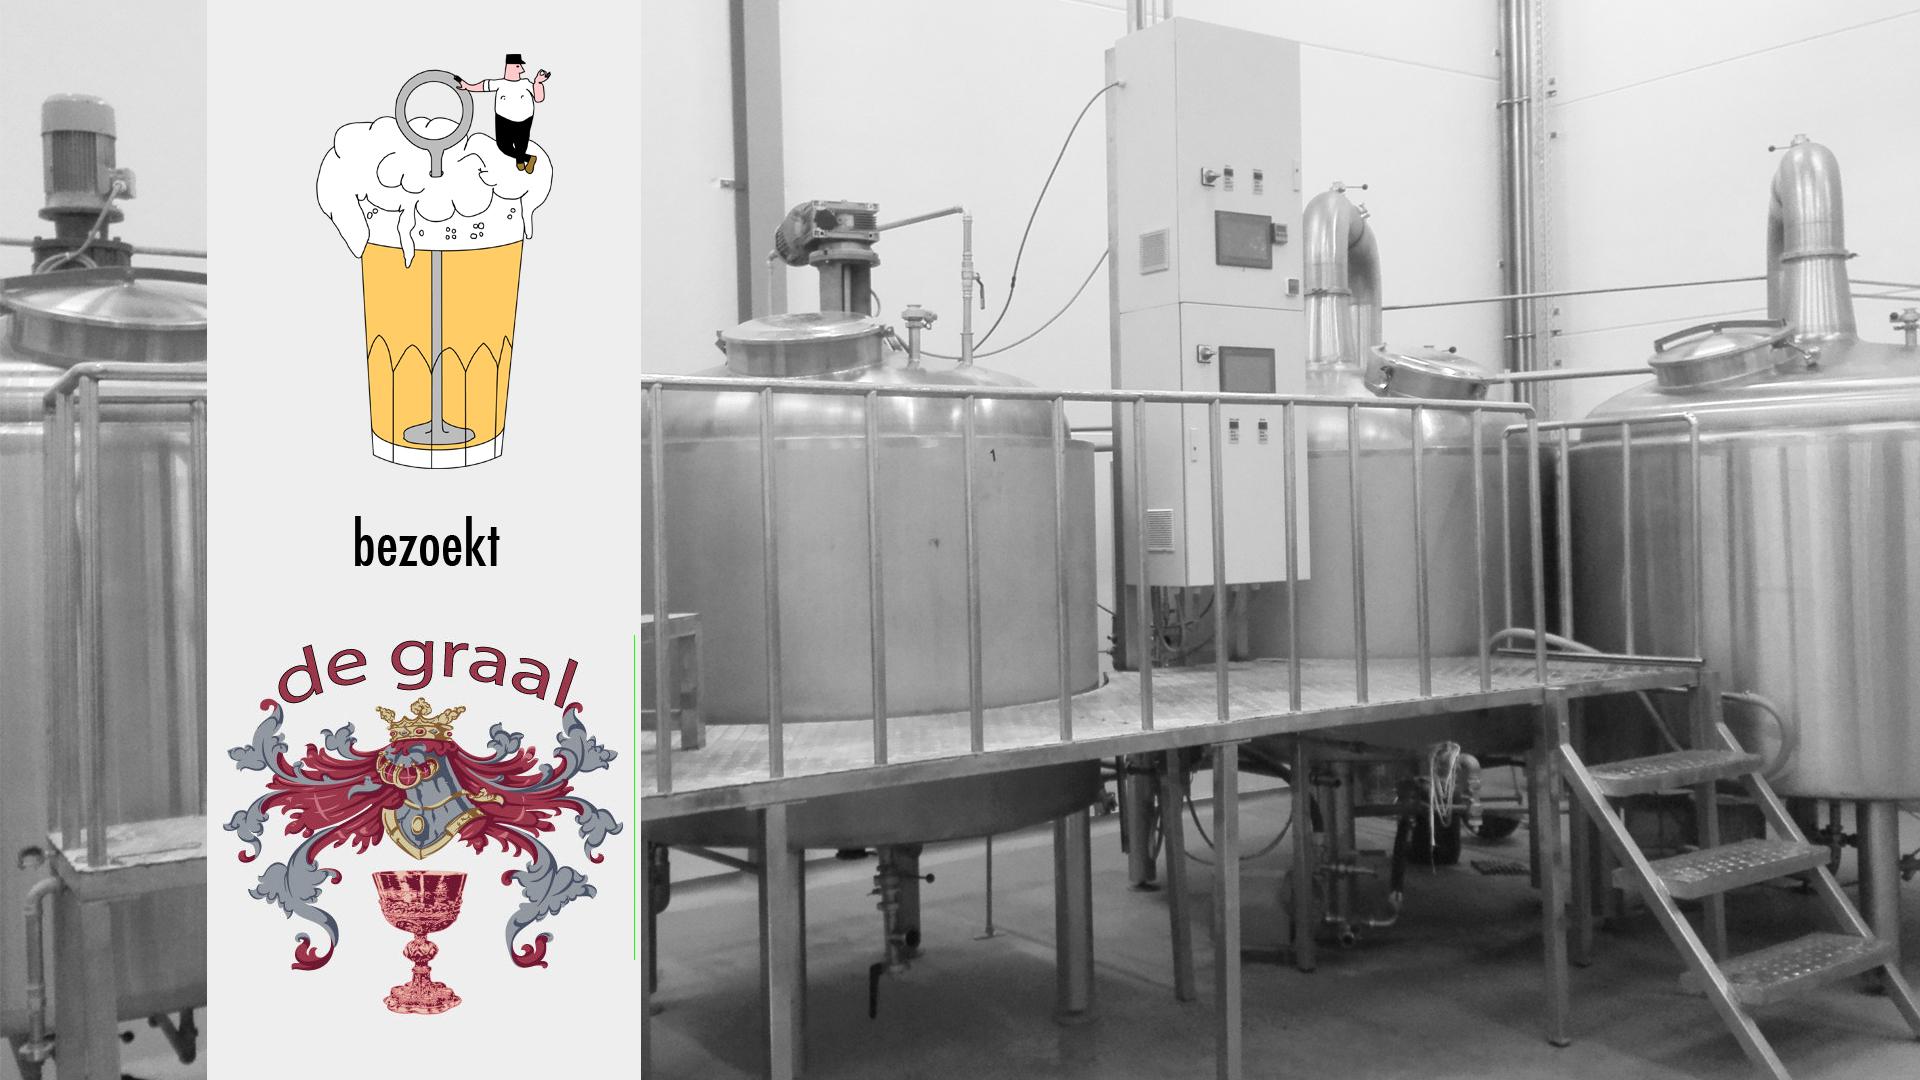 Visit De Graal brewery